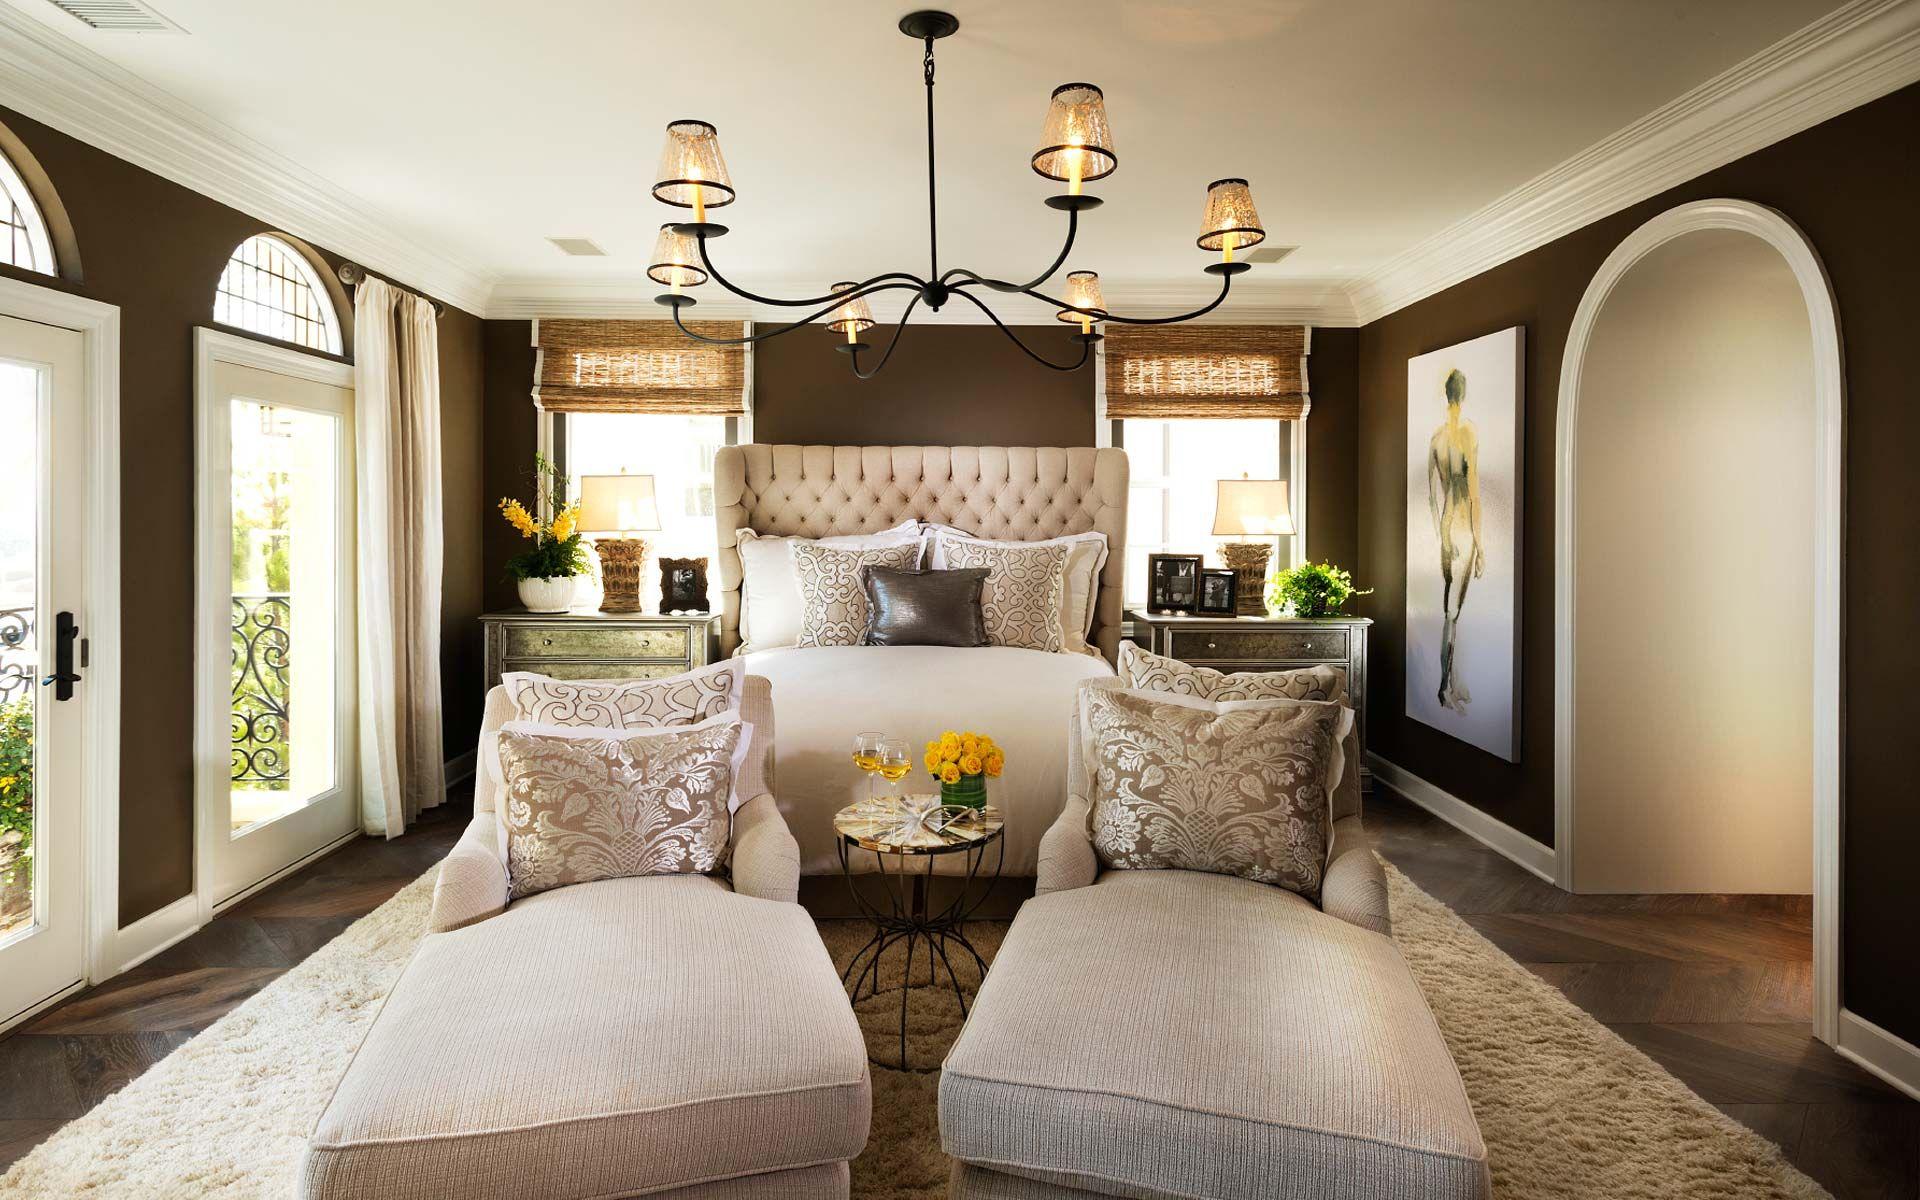 arterro in la costa by davidson communities model home on home interior design bedroom id=37542